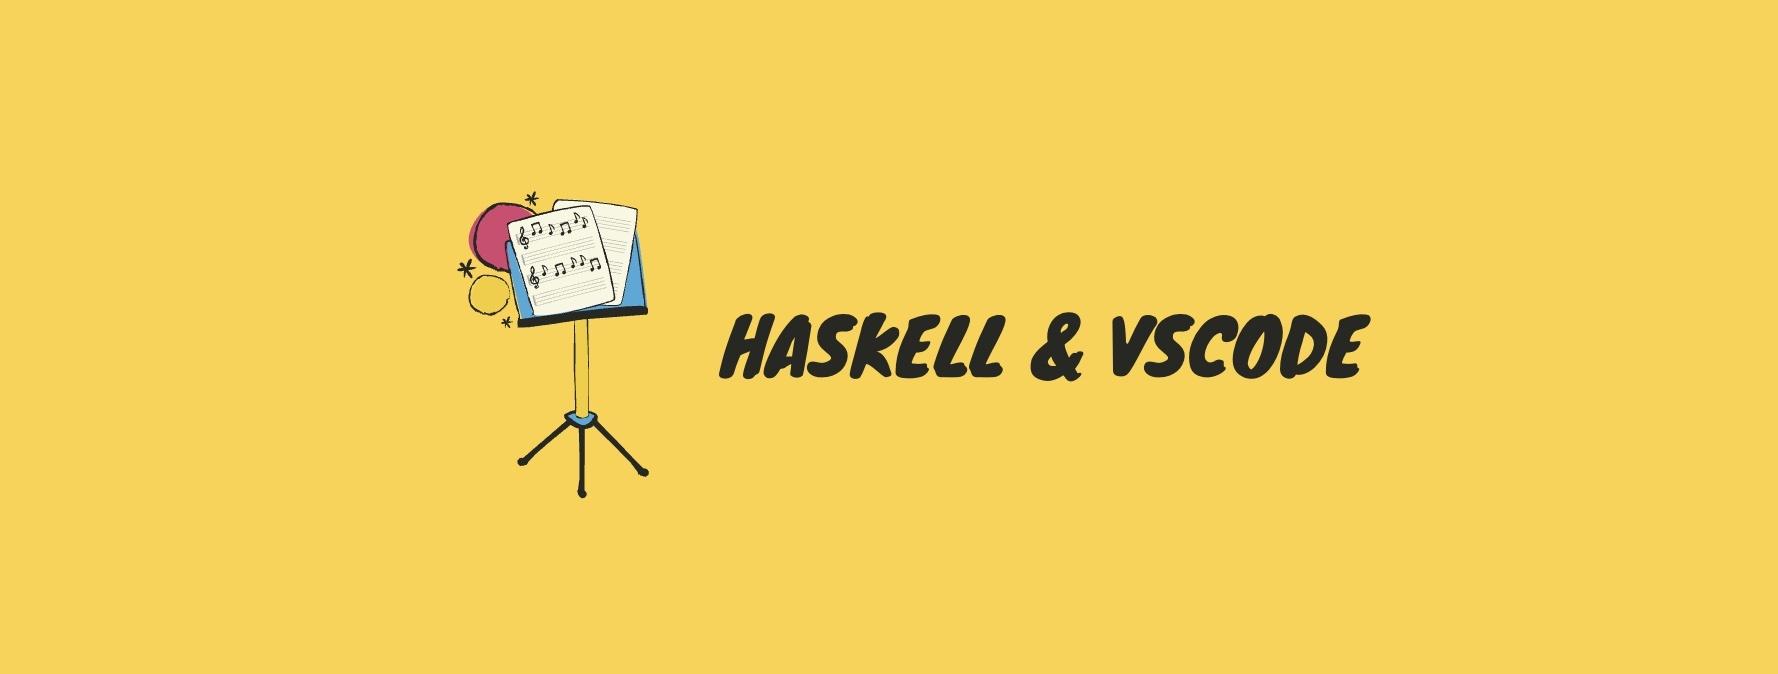 VSCode 集成 Haskell 环境